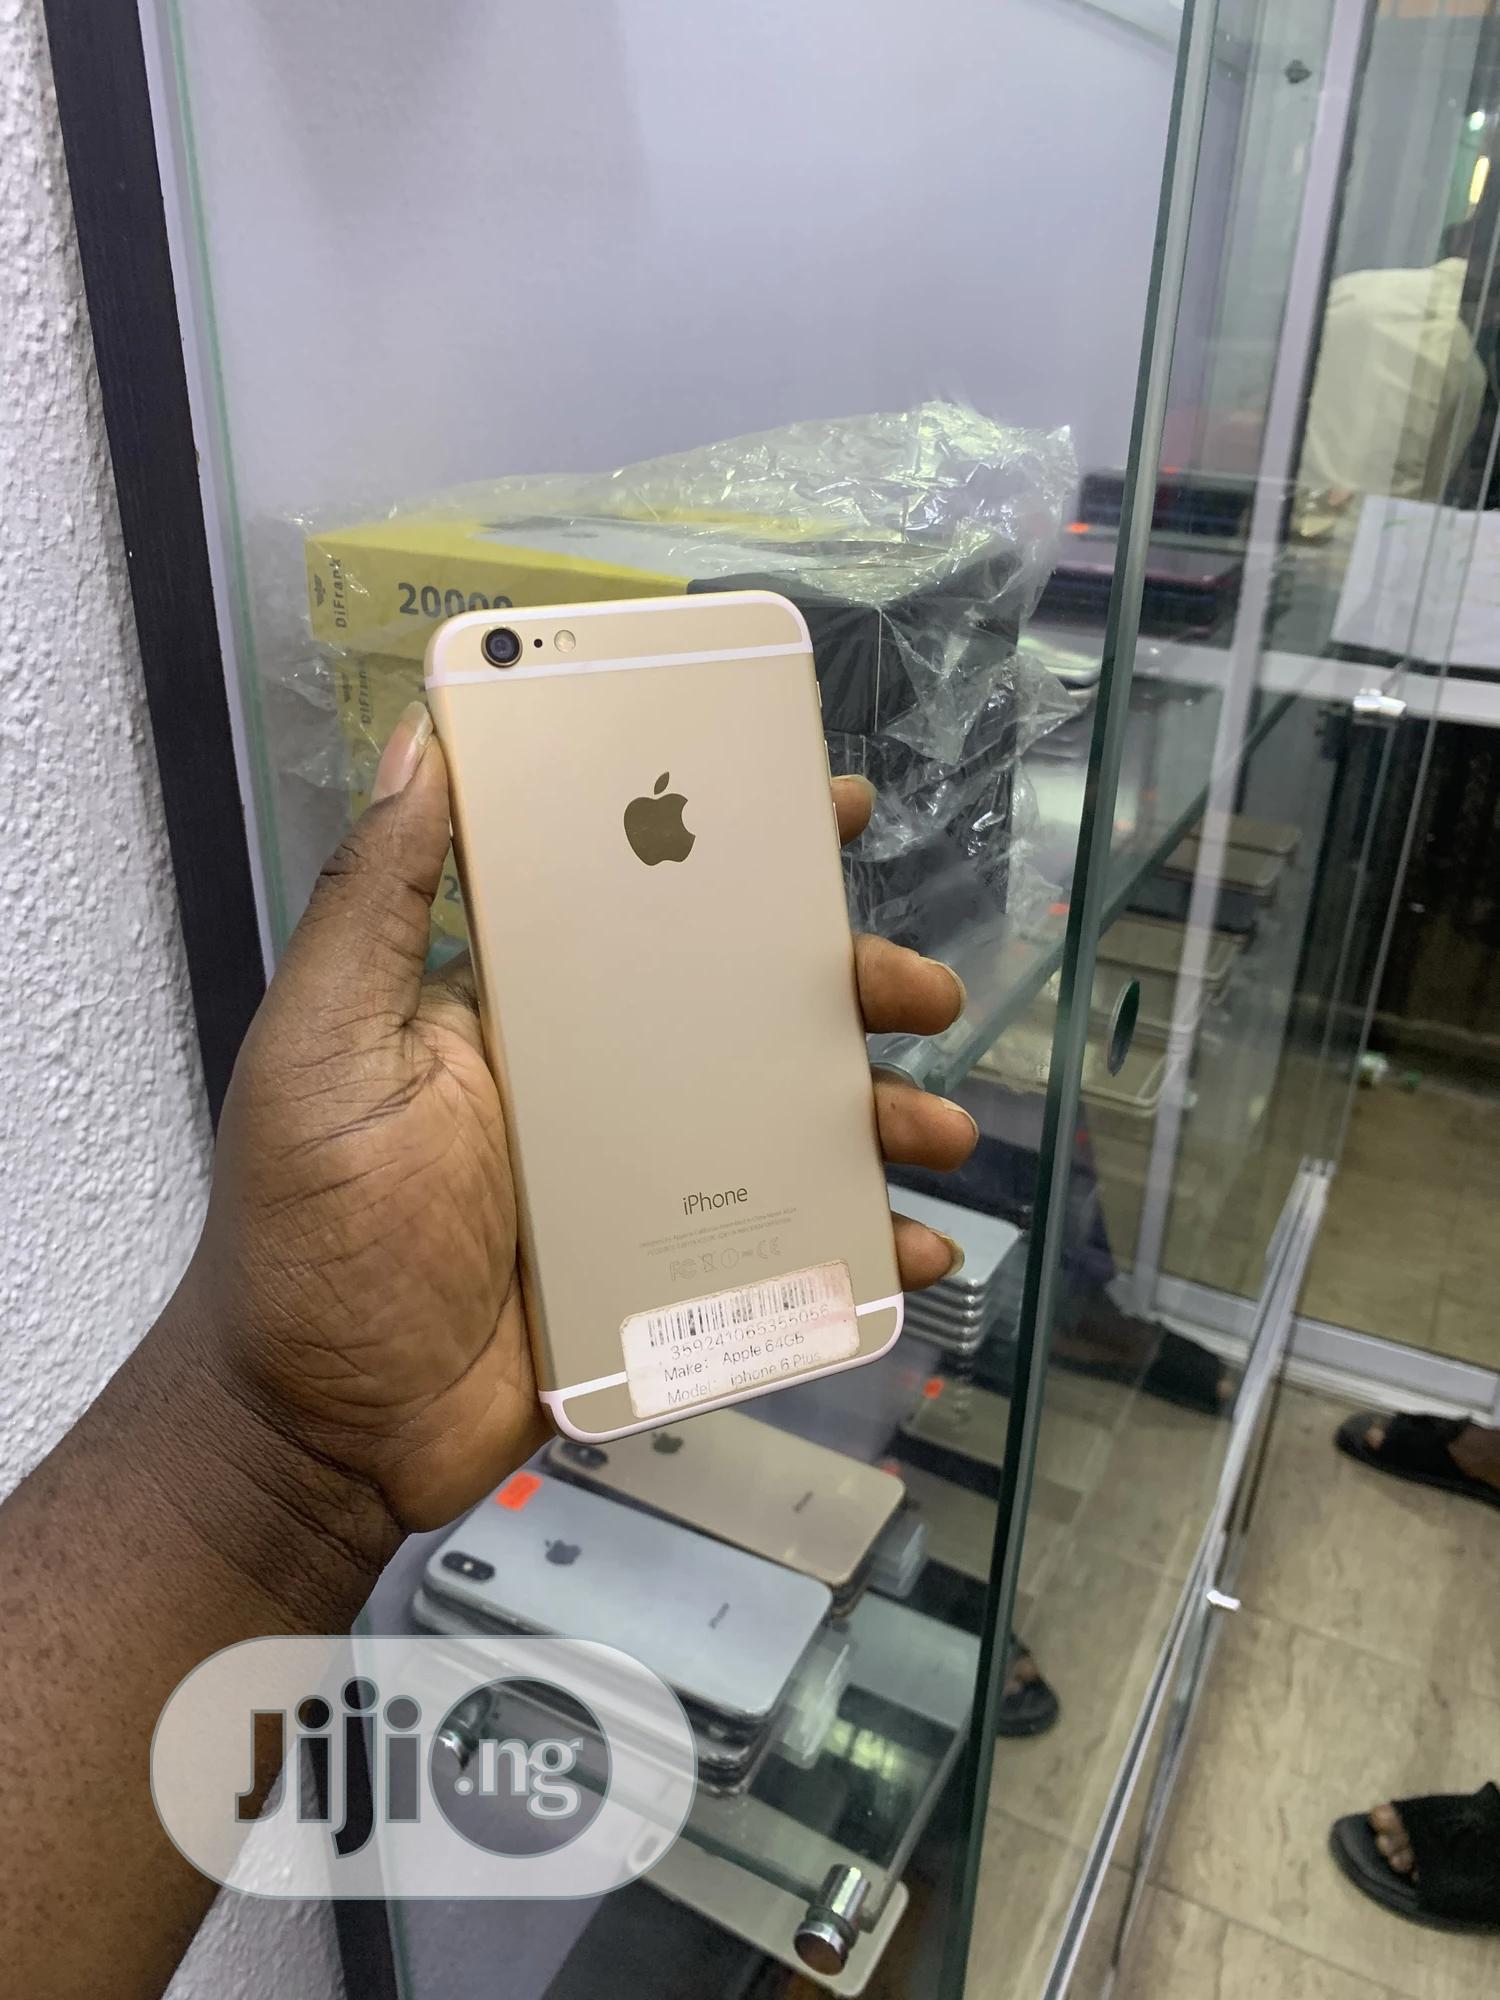 Apple iPhone 6 Plus 64 GB Gold   Mobile Phones for sale in Ikeja, Lagos State, Nigeria